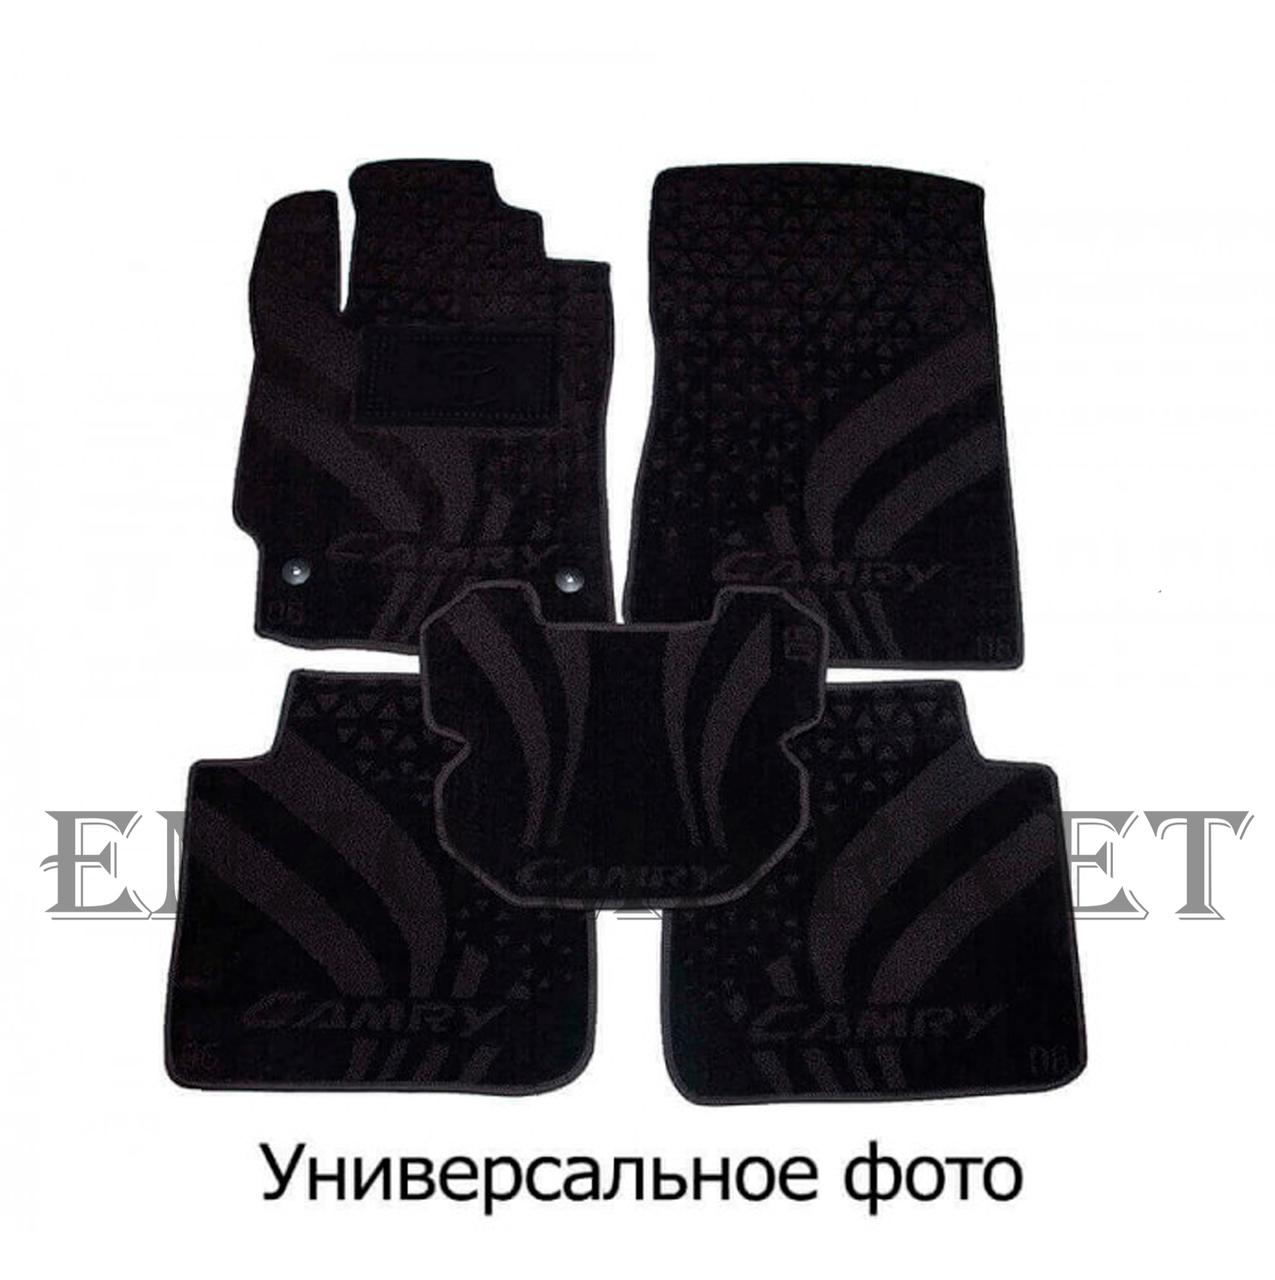 Текстильные автоковрики в салон Chevrolet Aveo 2012- (AVTO-Tex)